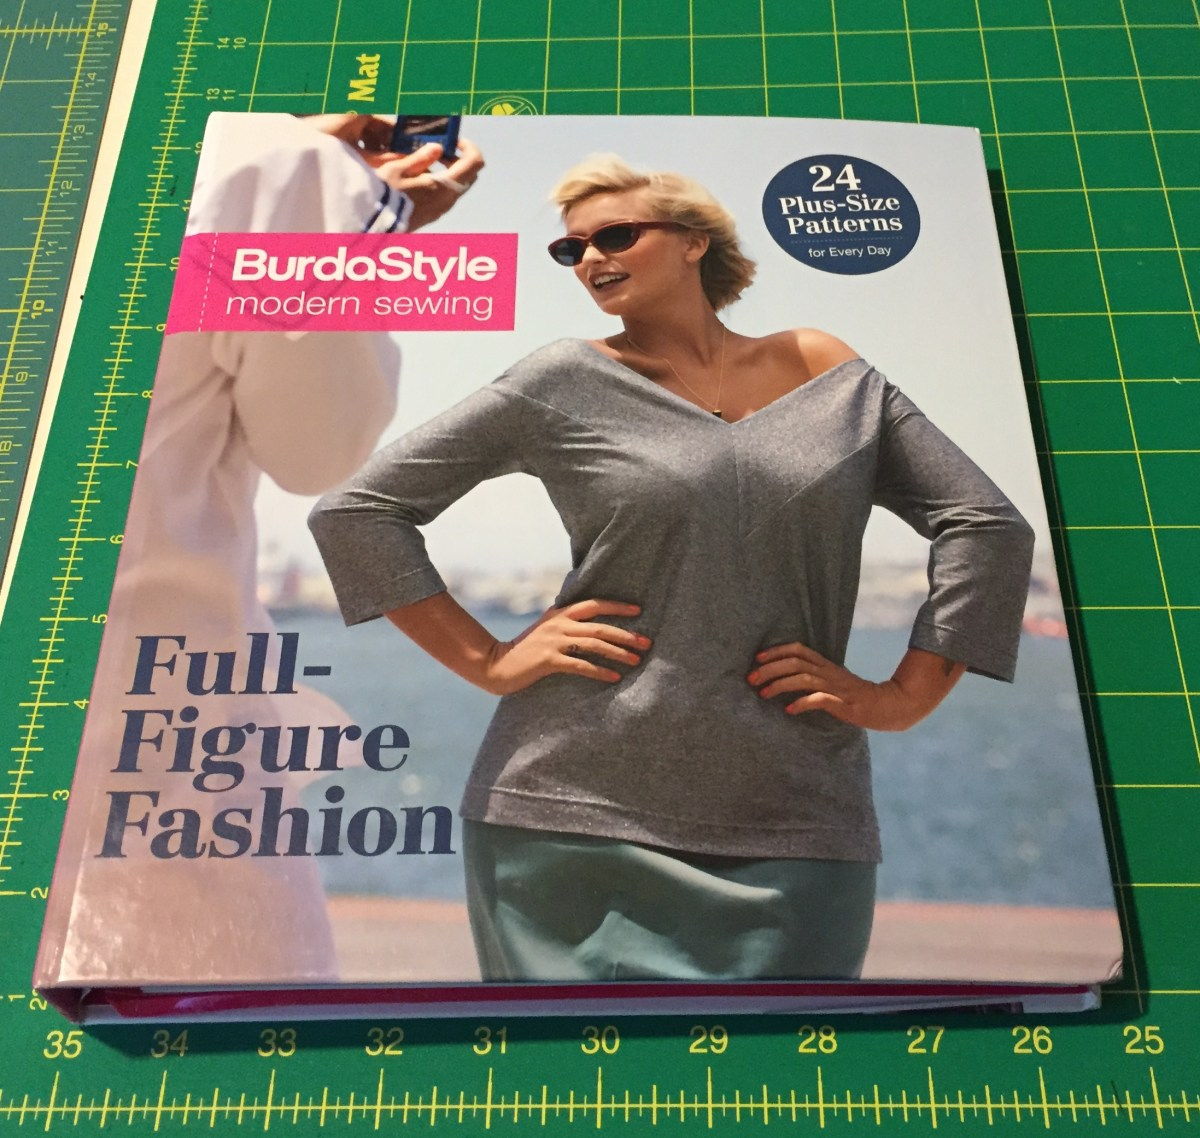 314cc3dff6a Book Review  BurdaStyle Modern Sewing – Full-Figure Fashion